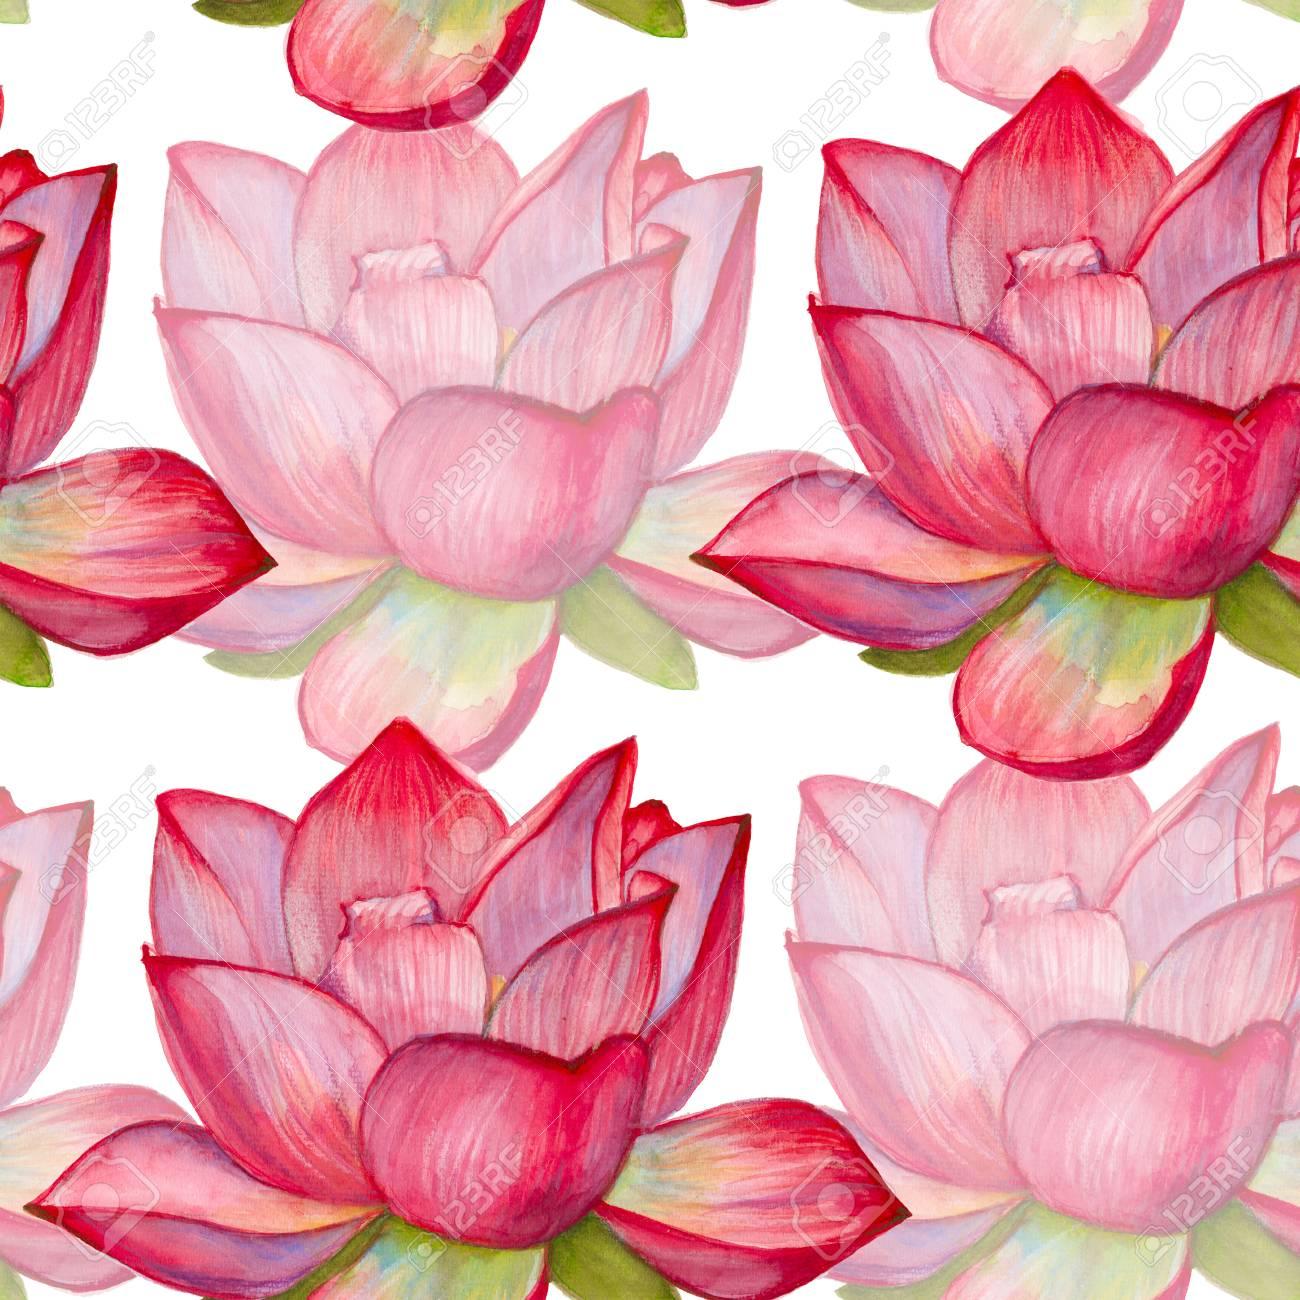 Background with pink lotus flower seamless pattern watercolor background with pink lotus flower seamless pattern watercolor illustration stock illustration 60372196 mightylinksfo